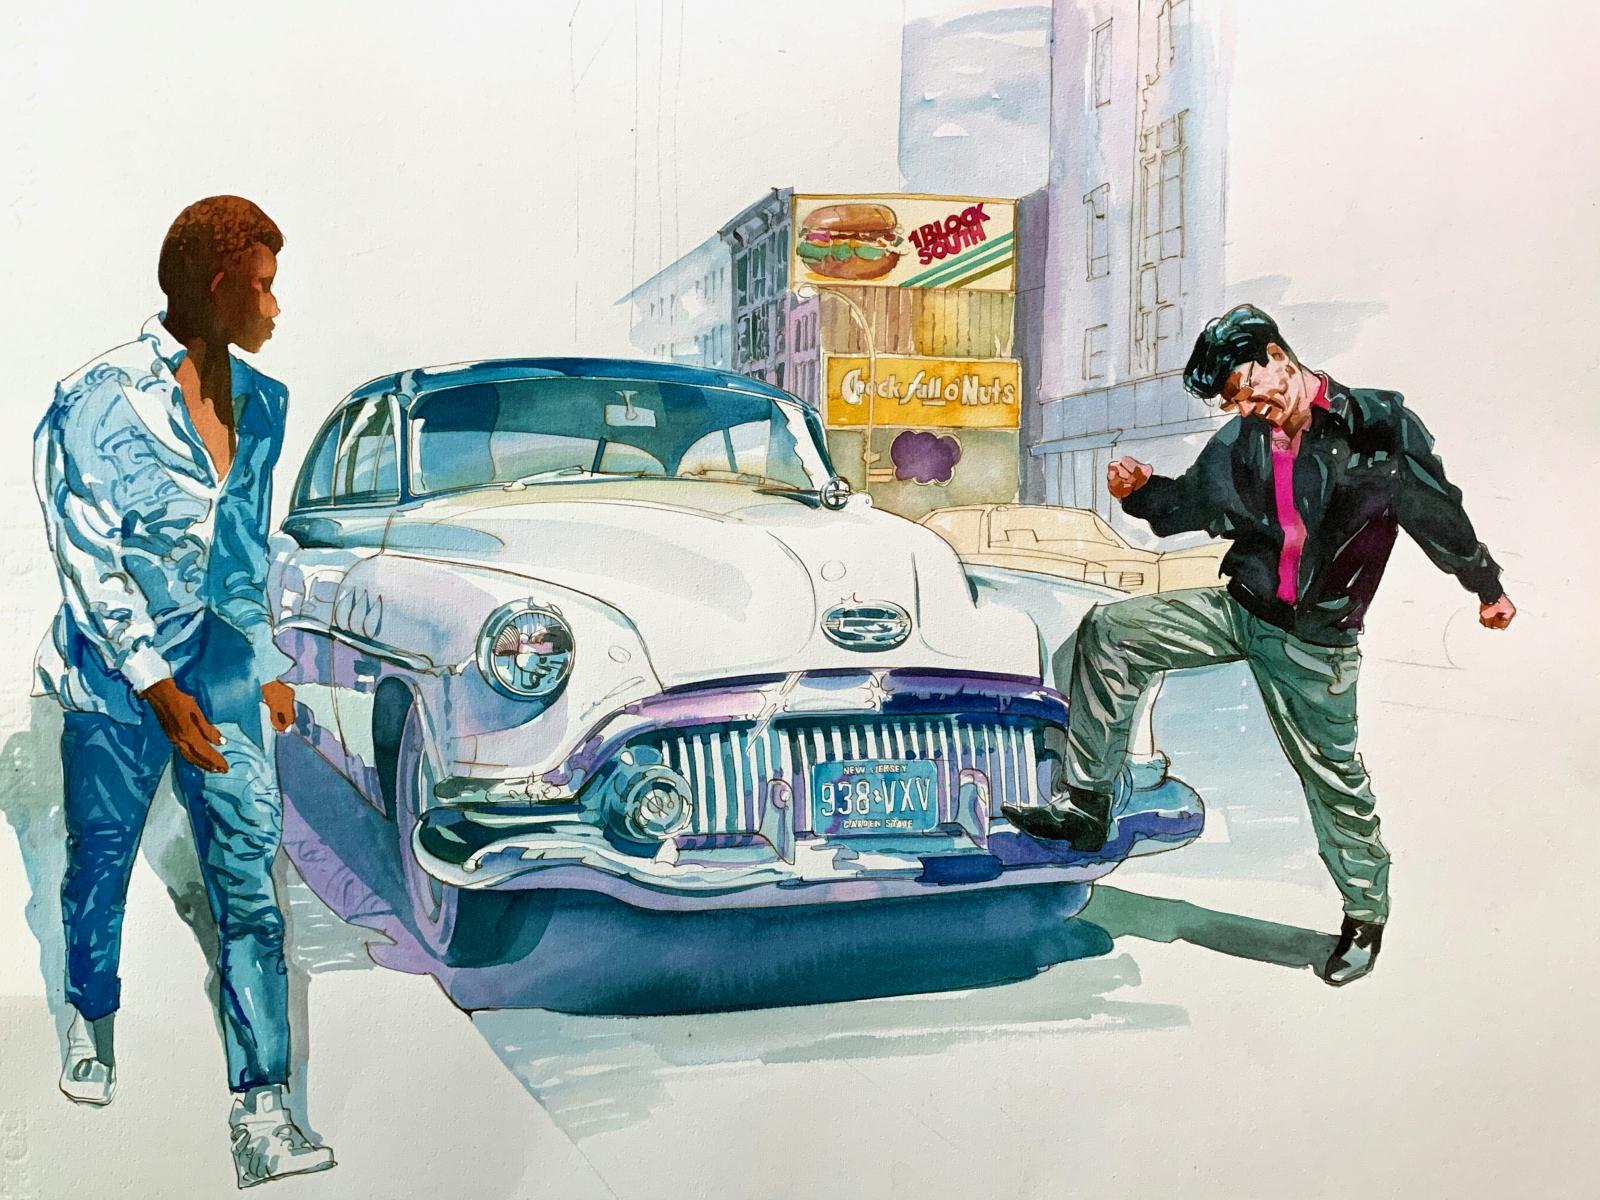 New York 1983, watercolor, 50x70